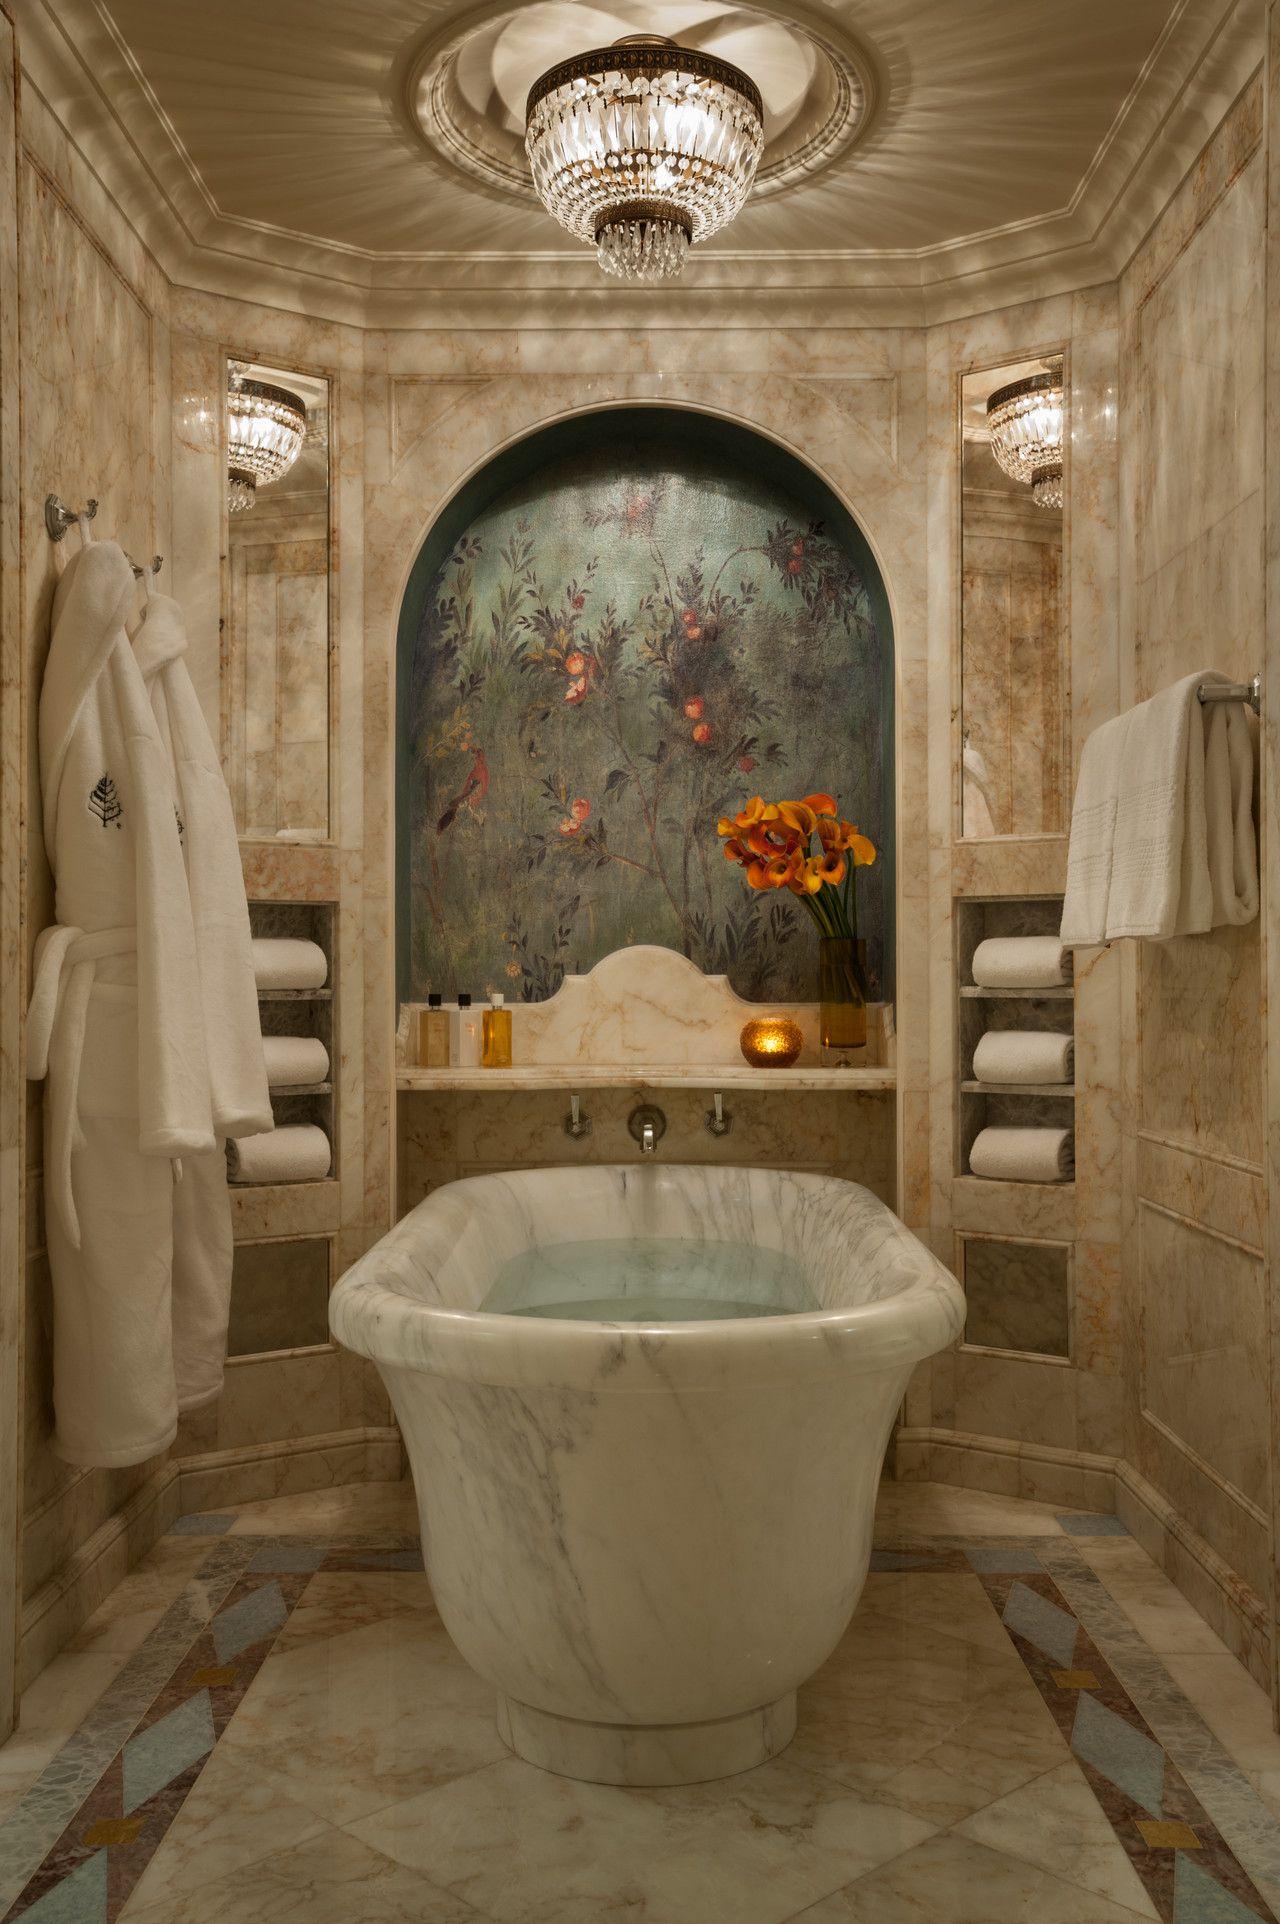 Dewey Seasons Hotel Lion Palace St Petersburg Bathroom Design Luxury Bathroom Interior Design Small Bathroom